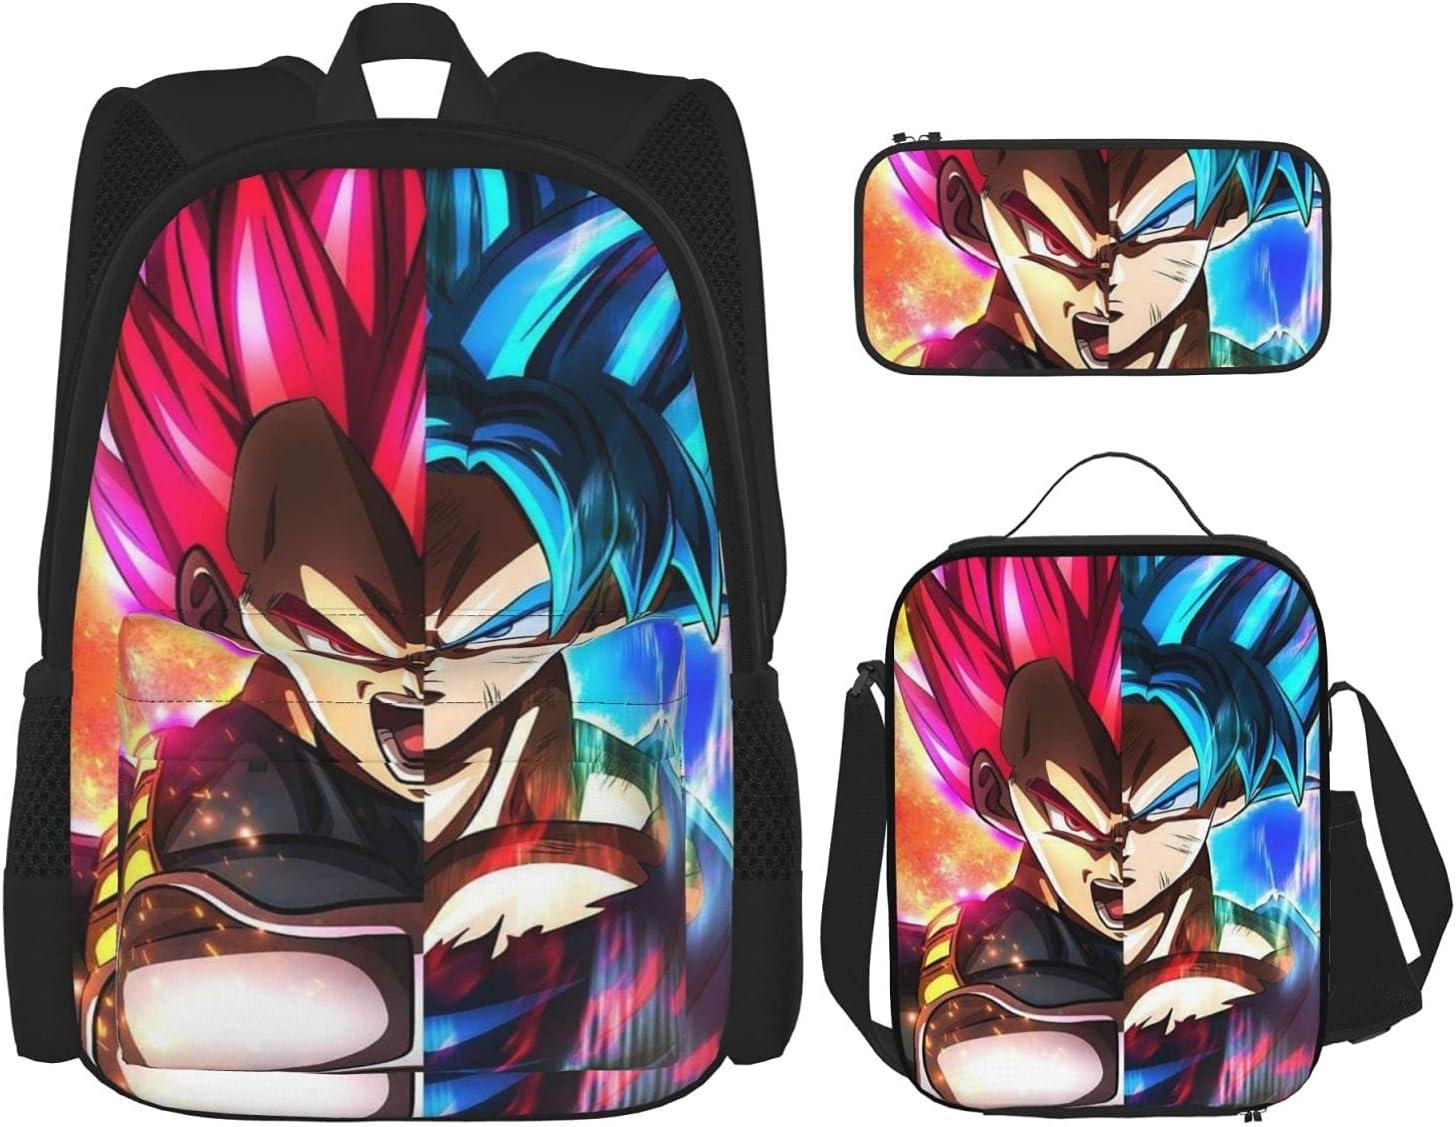 New item Dragon Ball Z Shoulder Bag Dealing full price reduction Ca Messenger Lunch Set Pencil